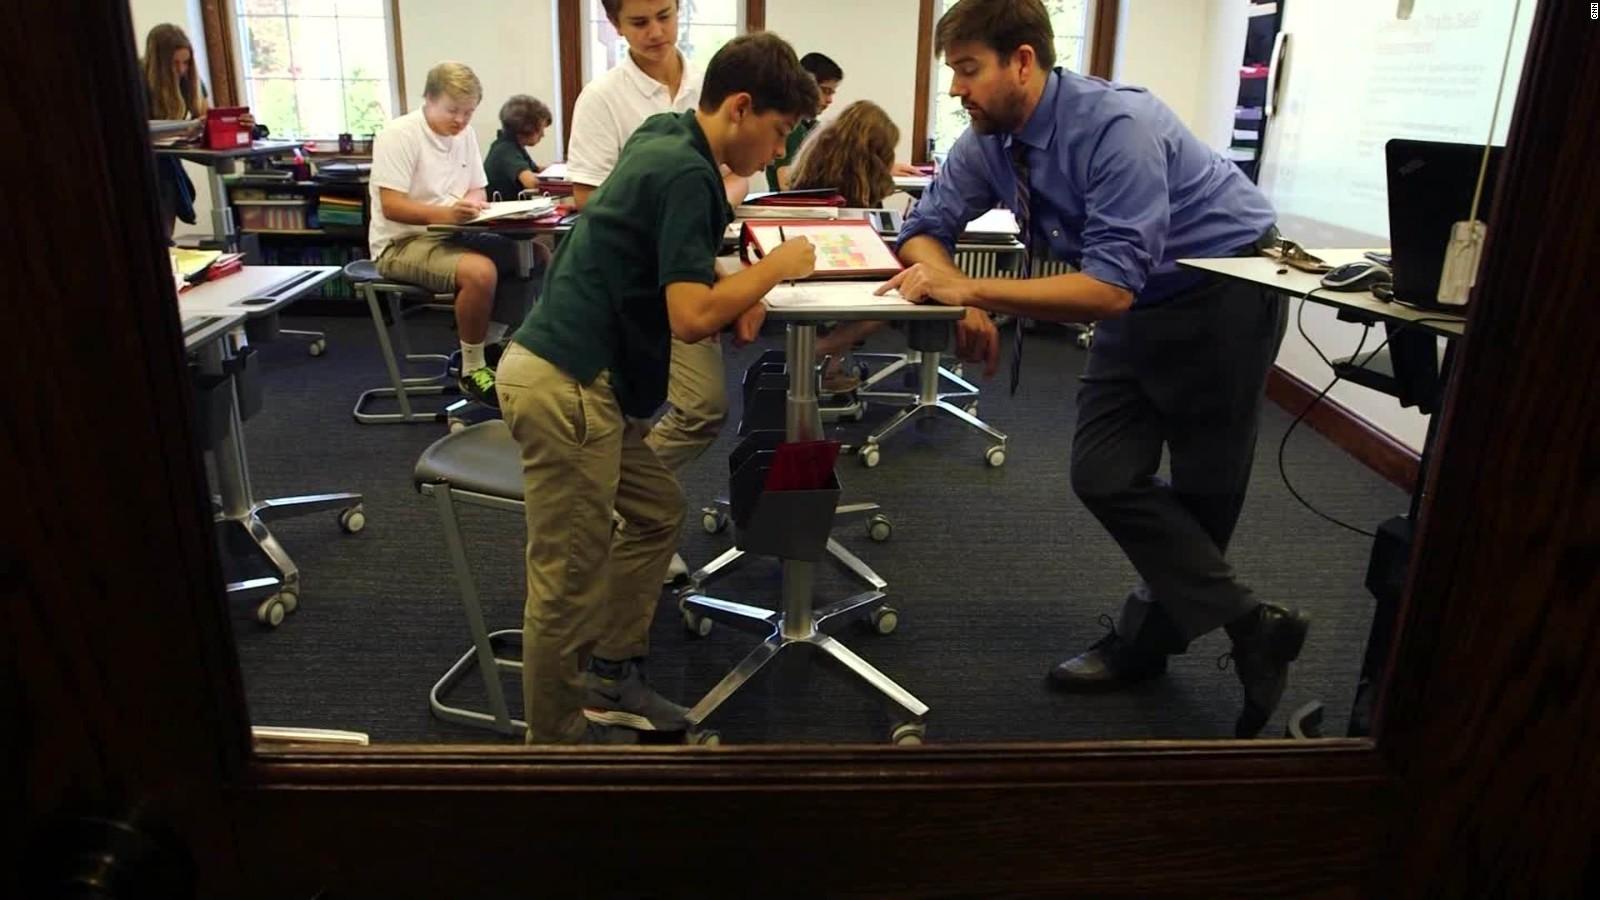 Strange Students Using Standing Desks To Learn Cnn Best Image Libraries Weasiibadanjobscom